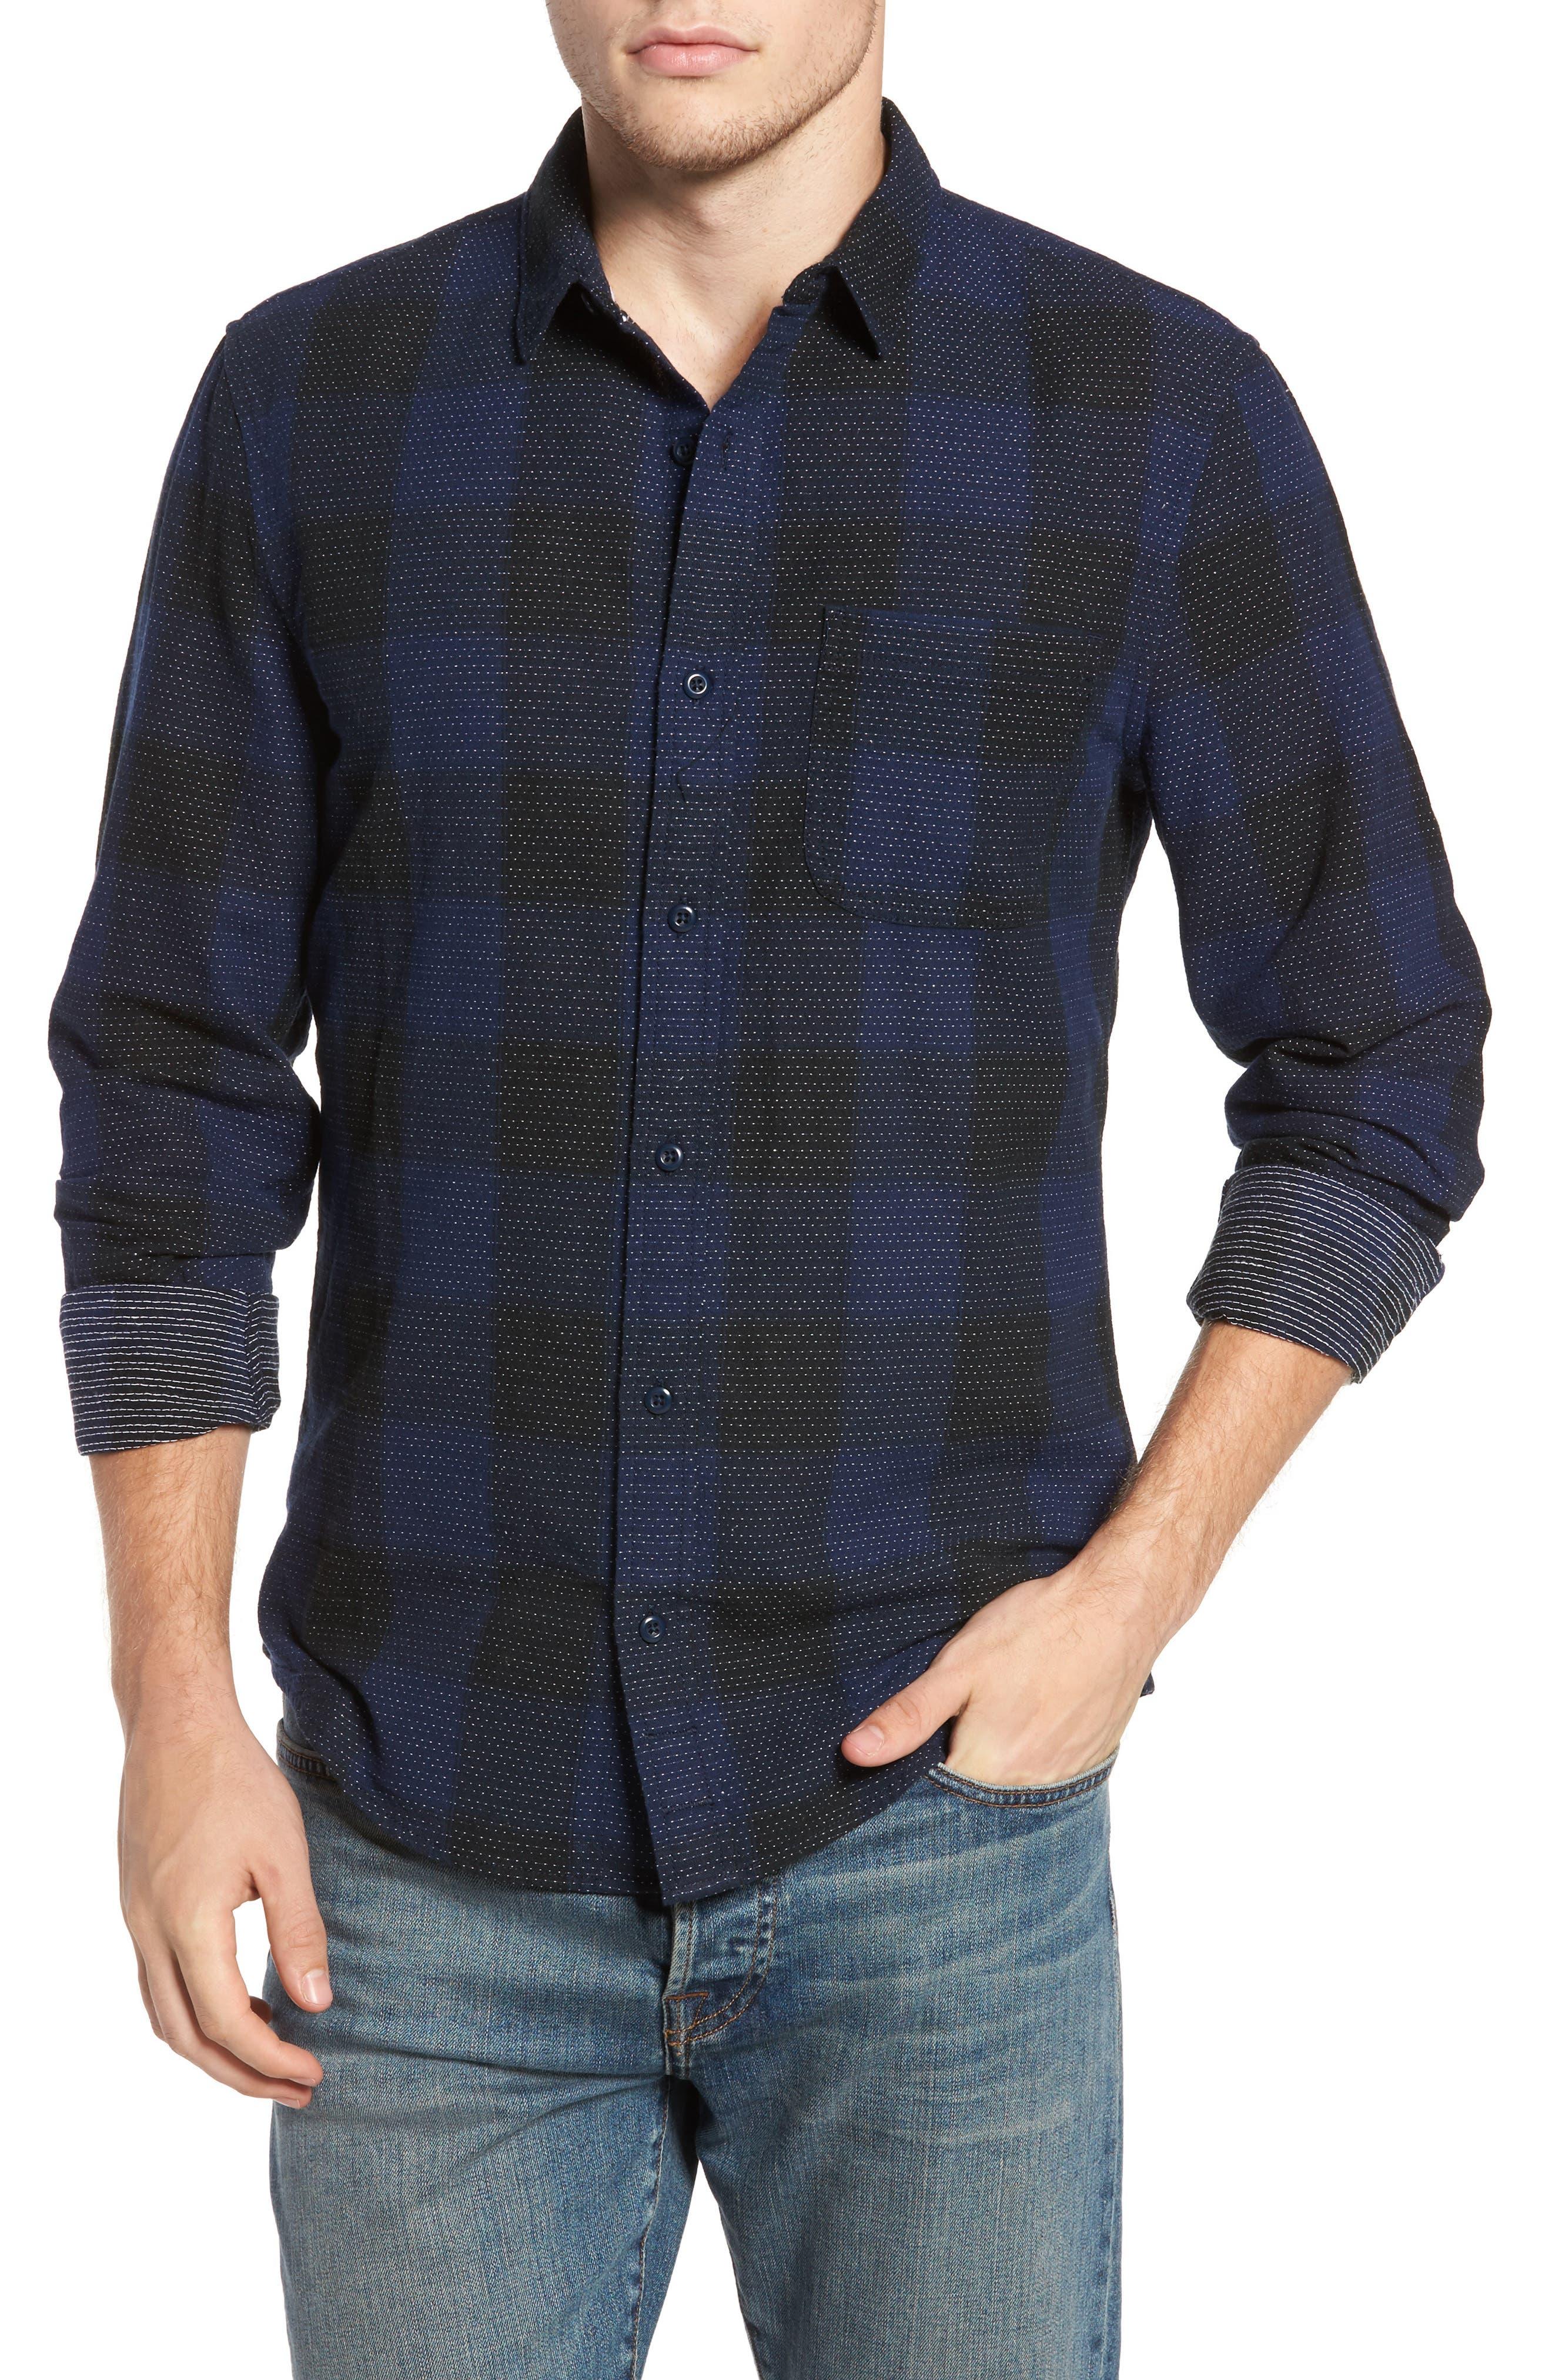 Alternate Image 1 Selected - 1901 Dot Buffalo Plaid Shirt